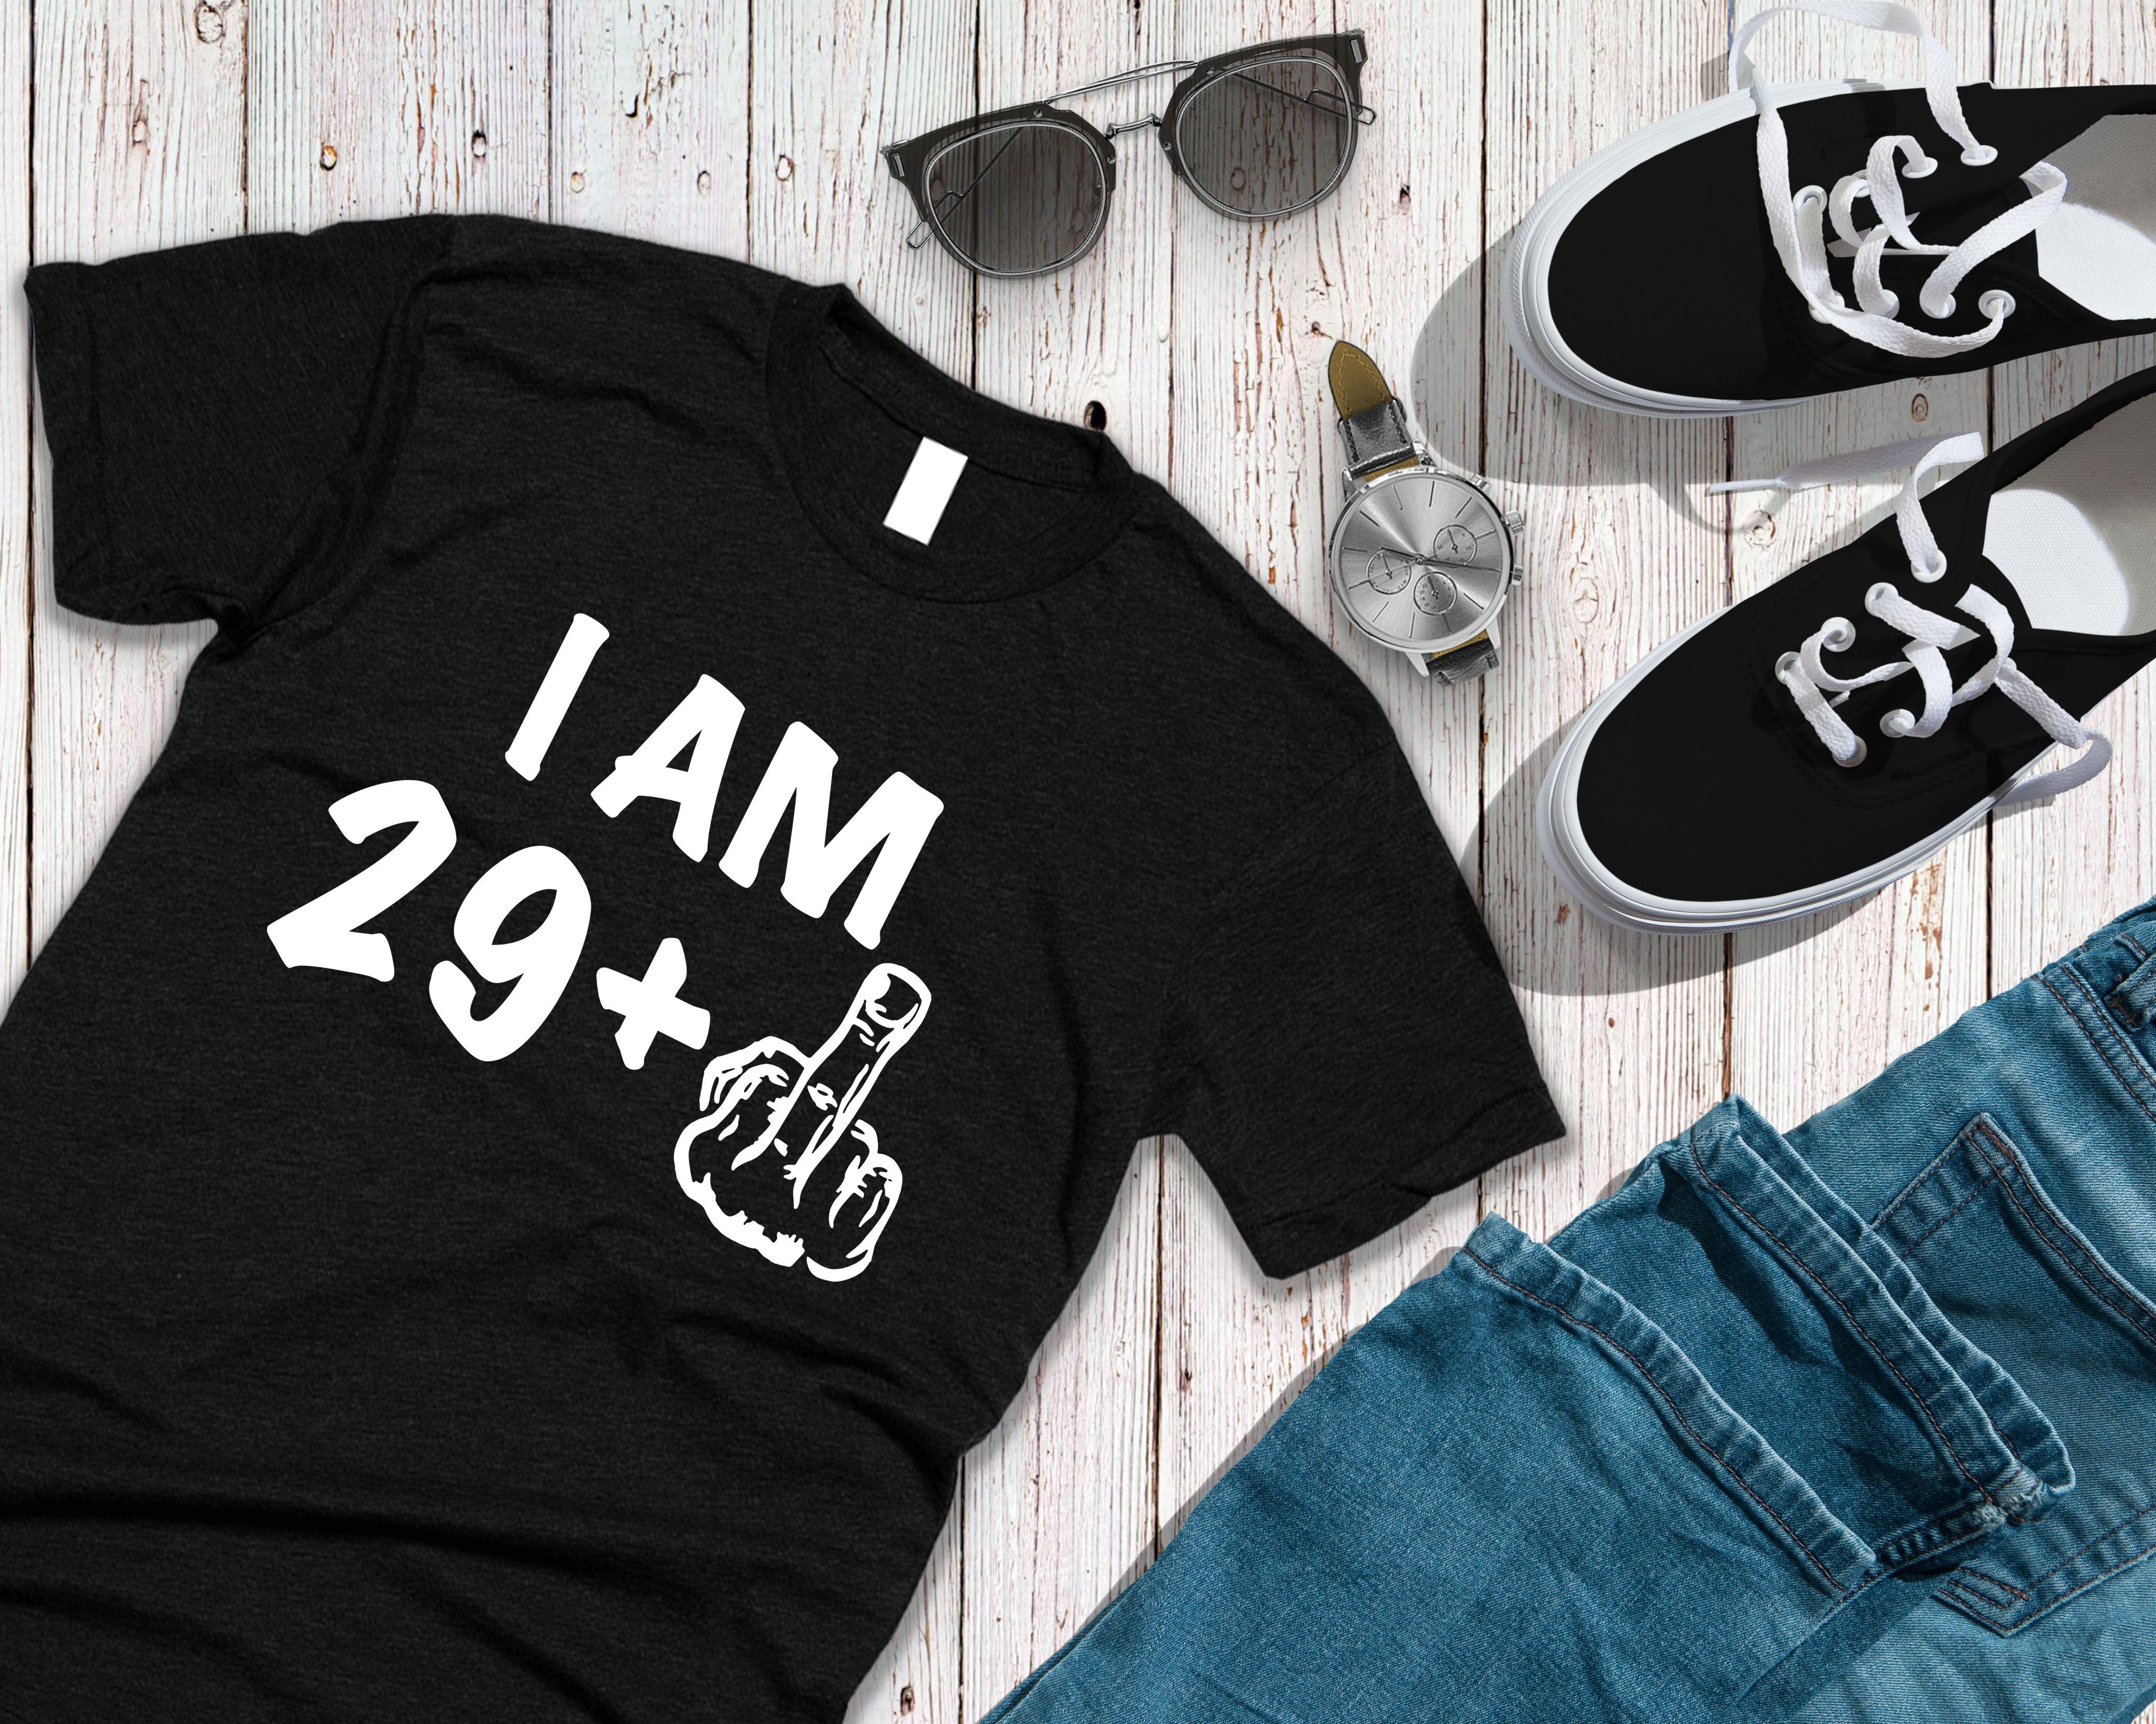 30th birthday gift shirt birthday tee shirt gift clothes